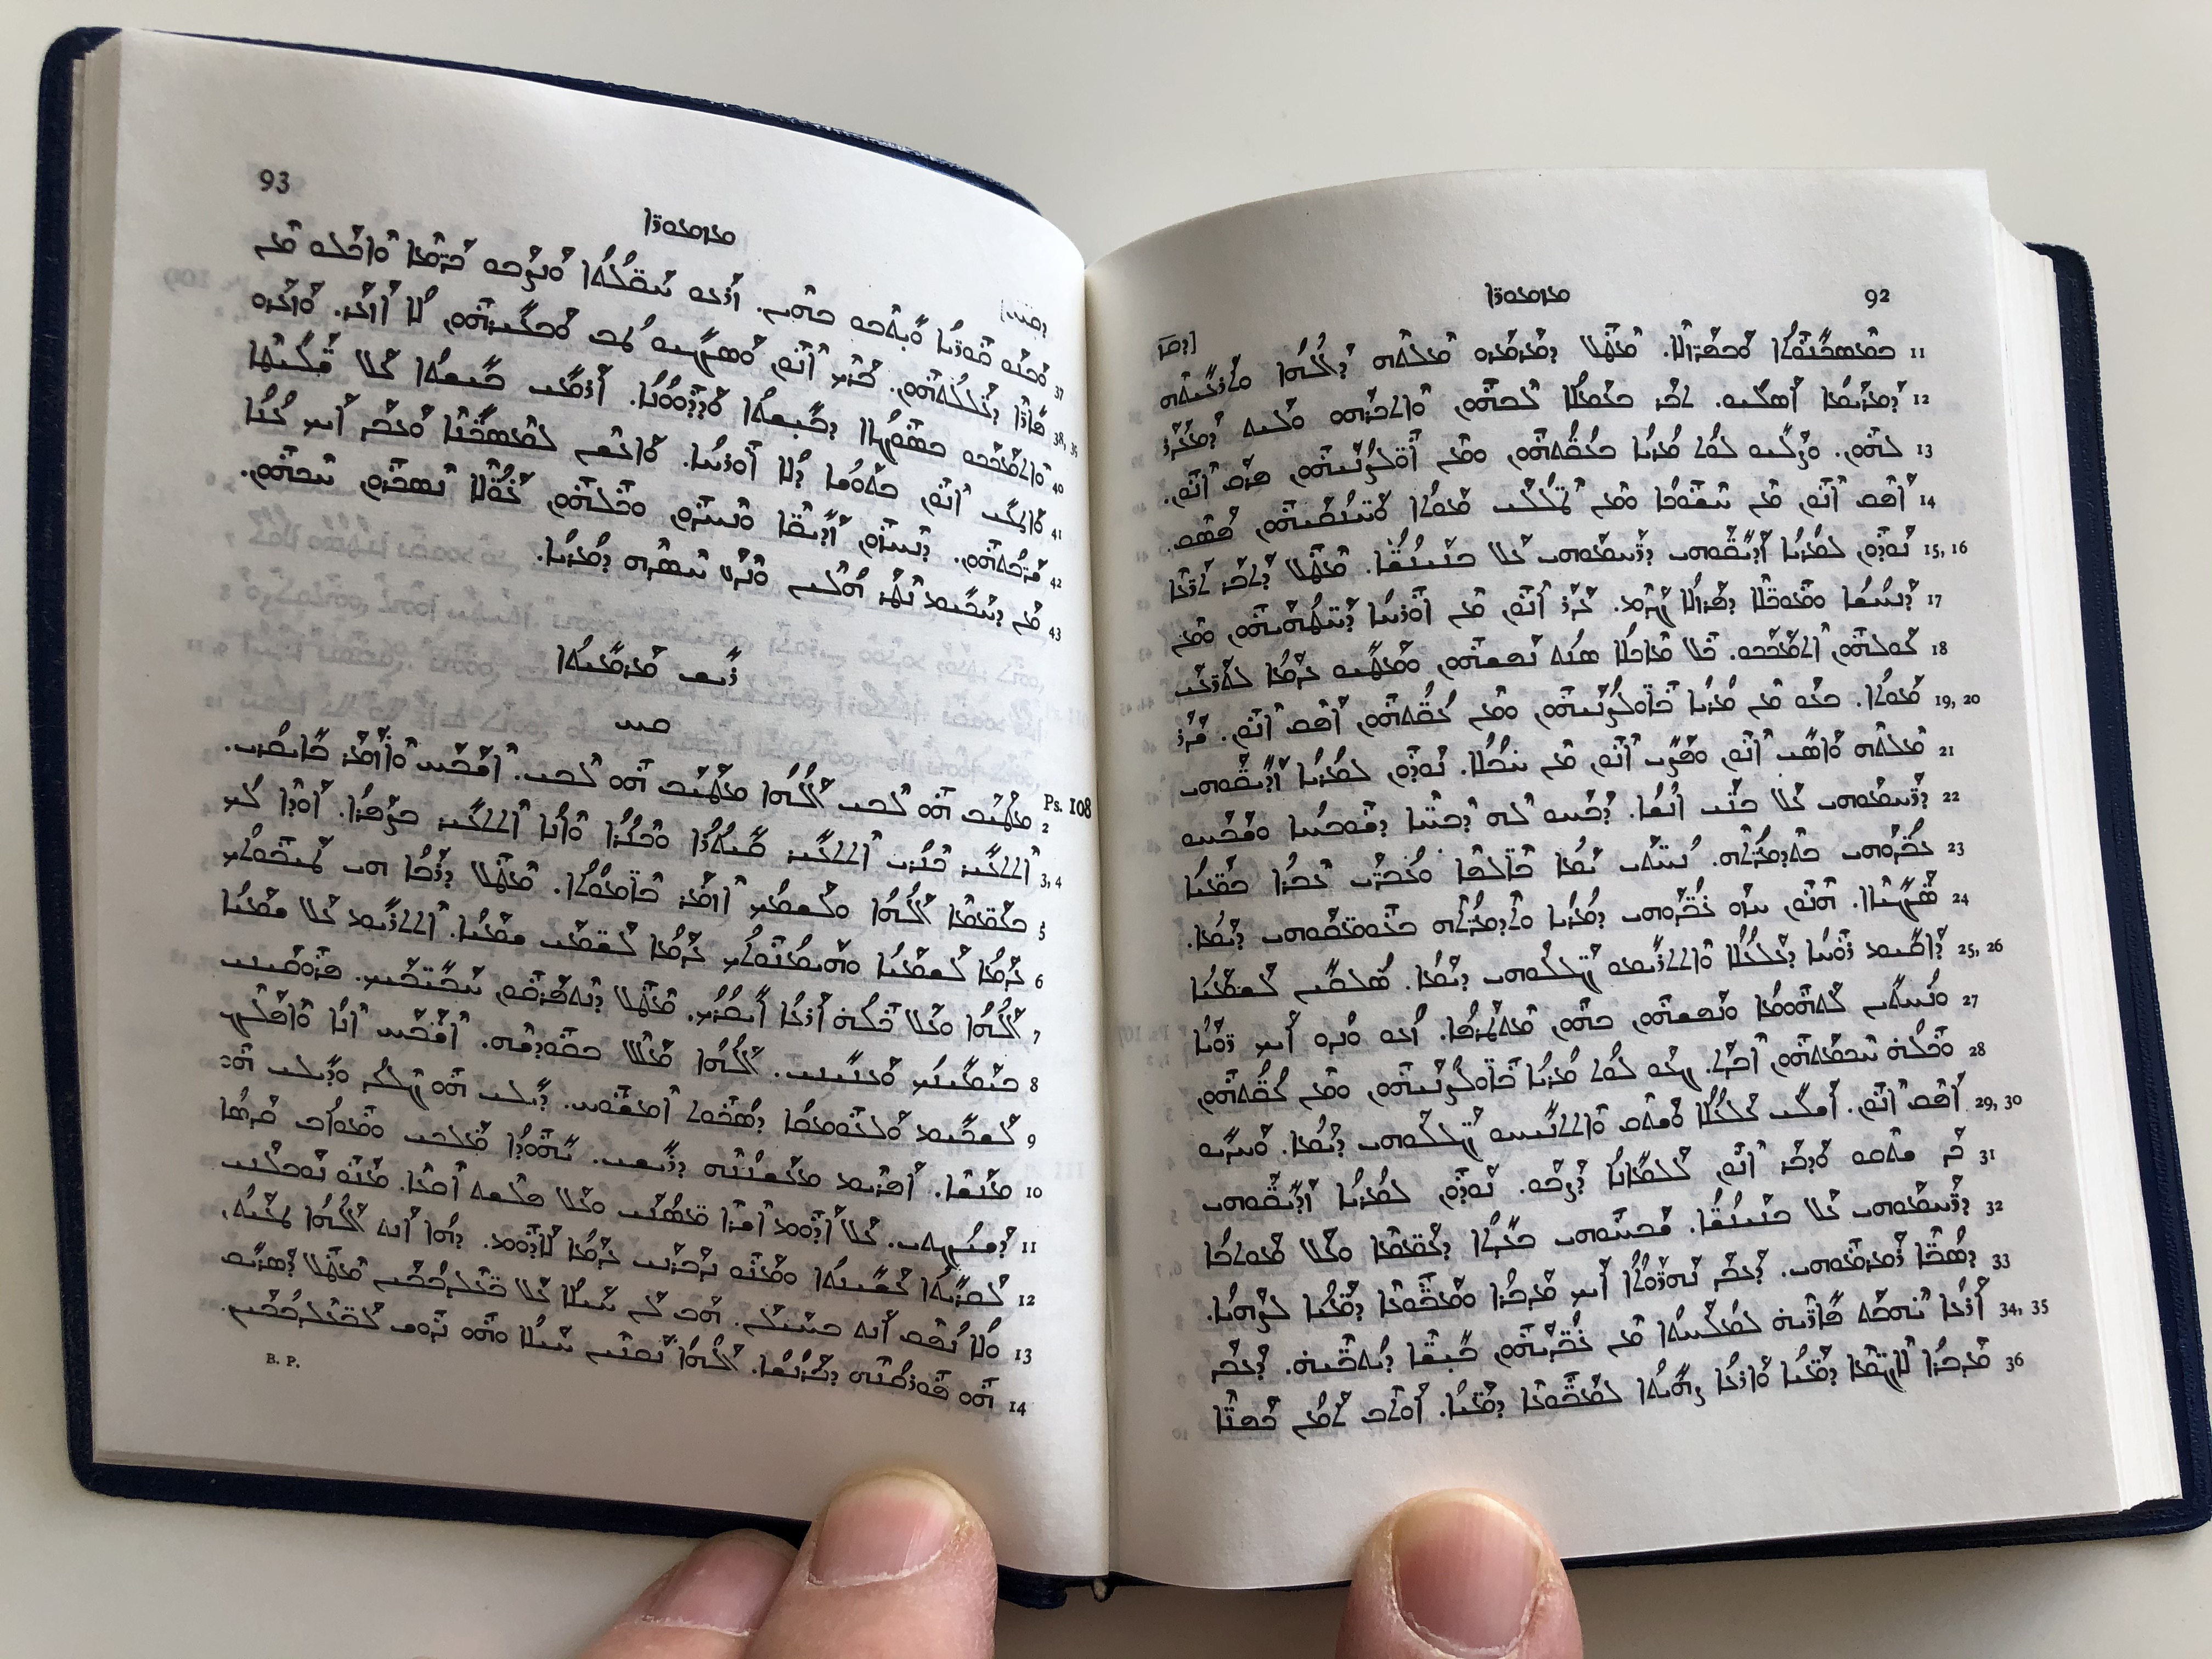 syriac-new-testament-and-psalms-s-ryanice-incil-ve-mezmurlar-blue-pocket-size-edition-342-ubs-epf-1991-4m-9.jpg